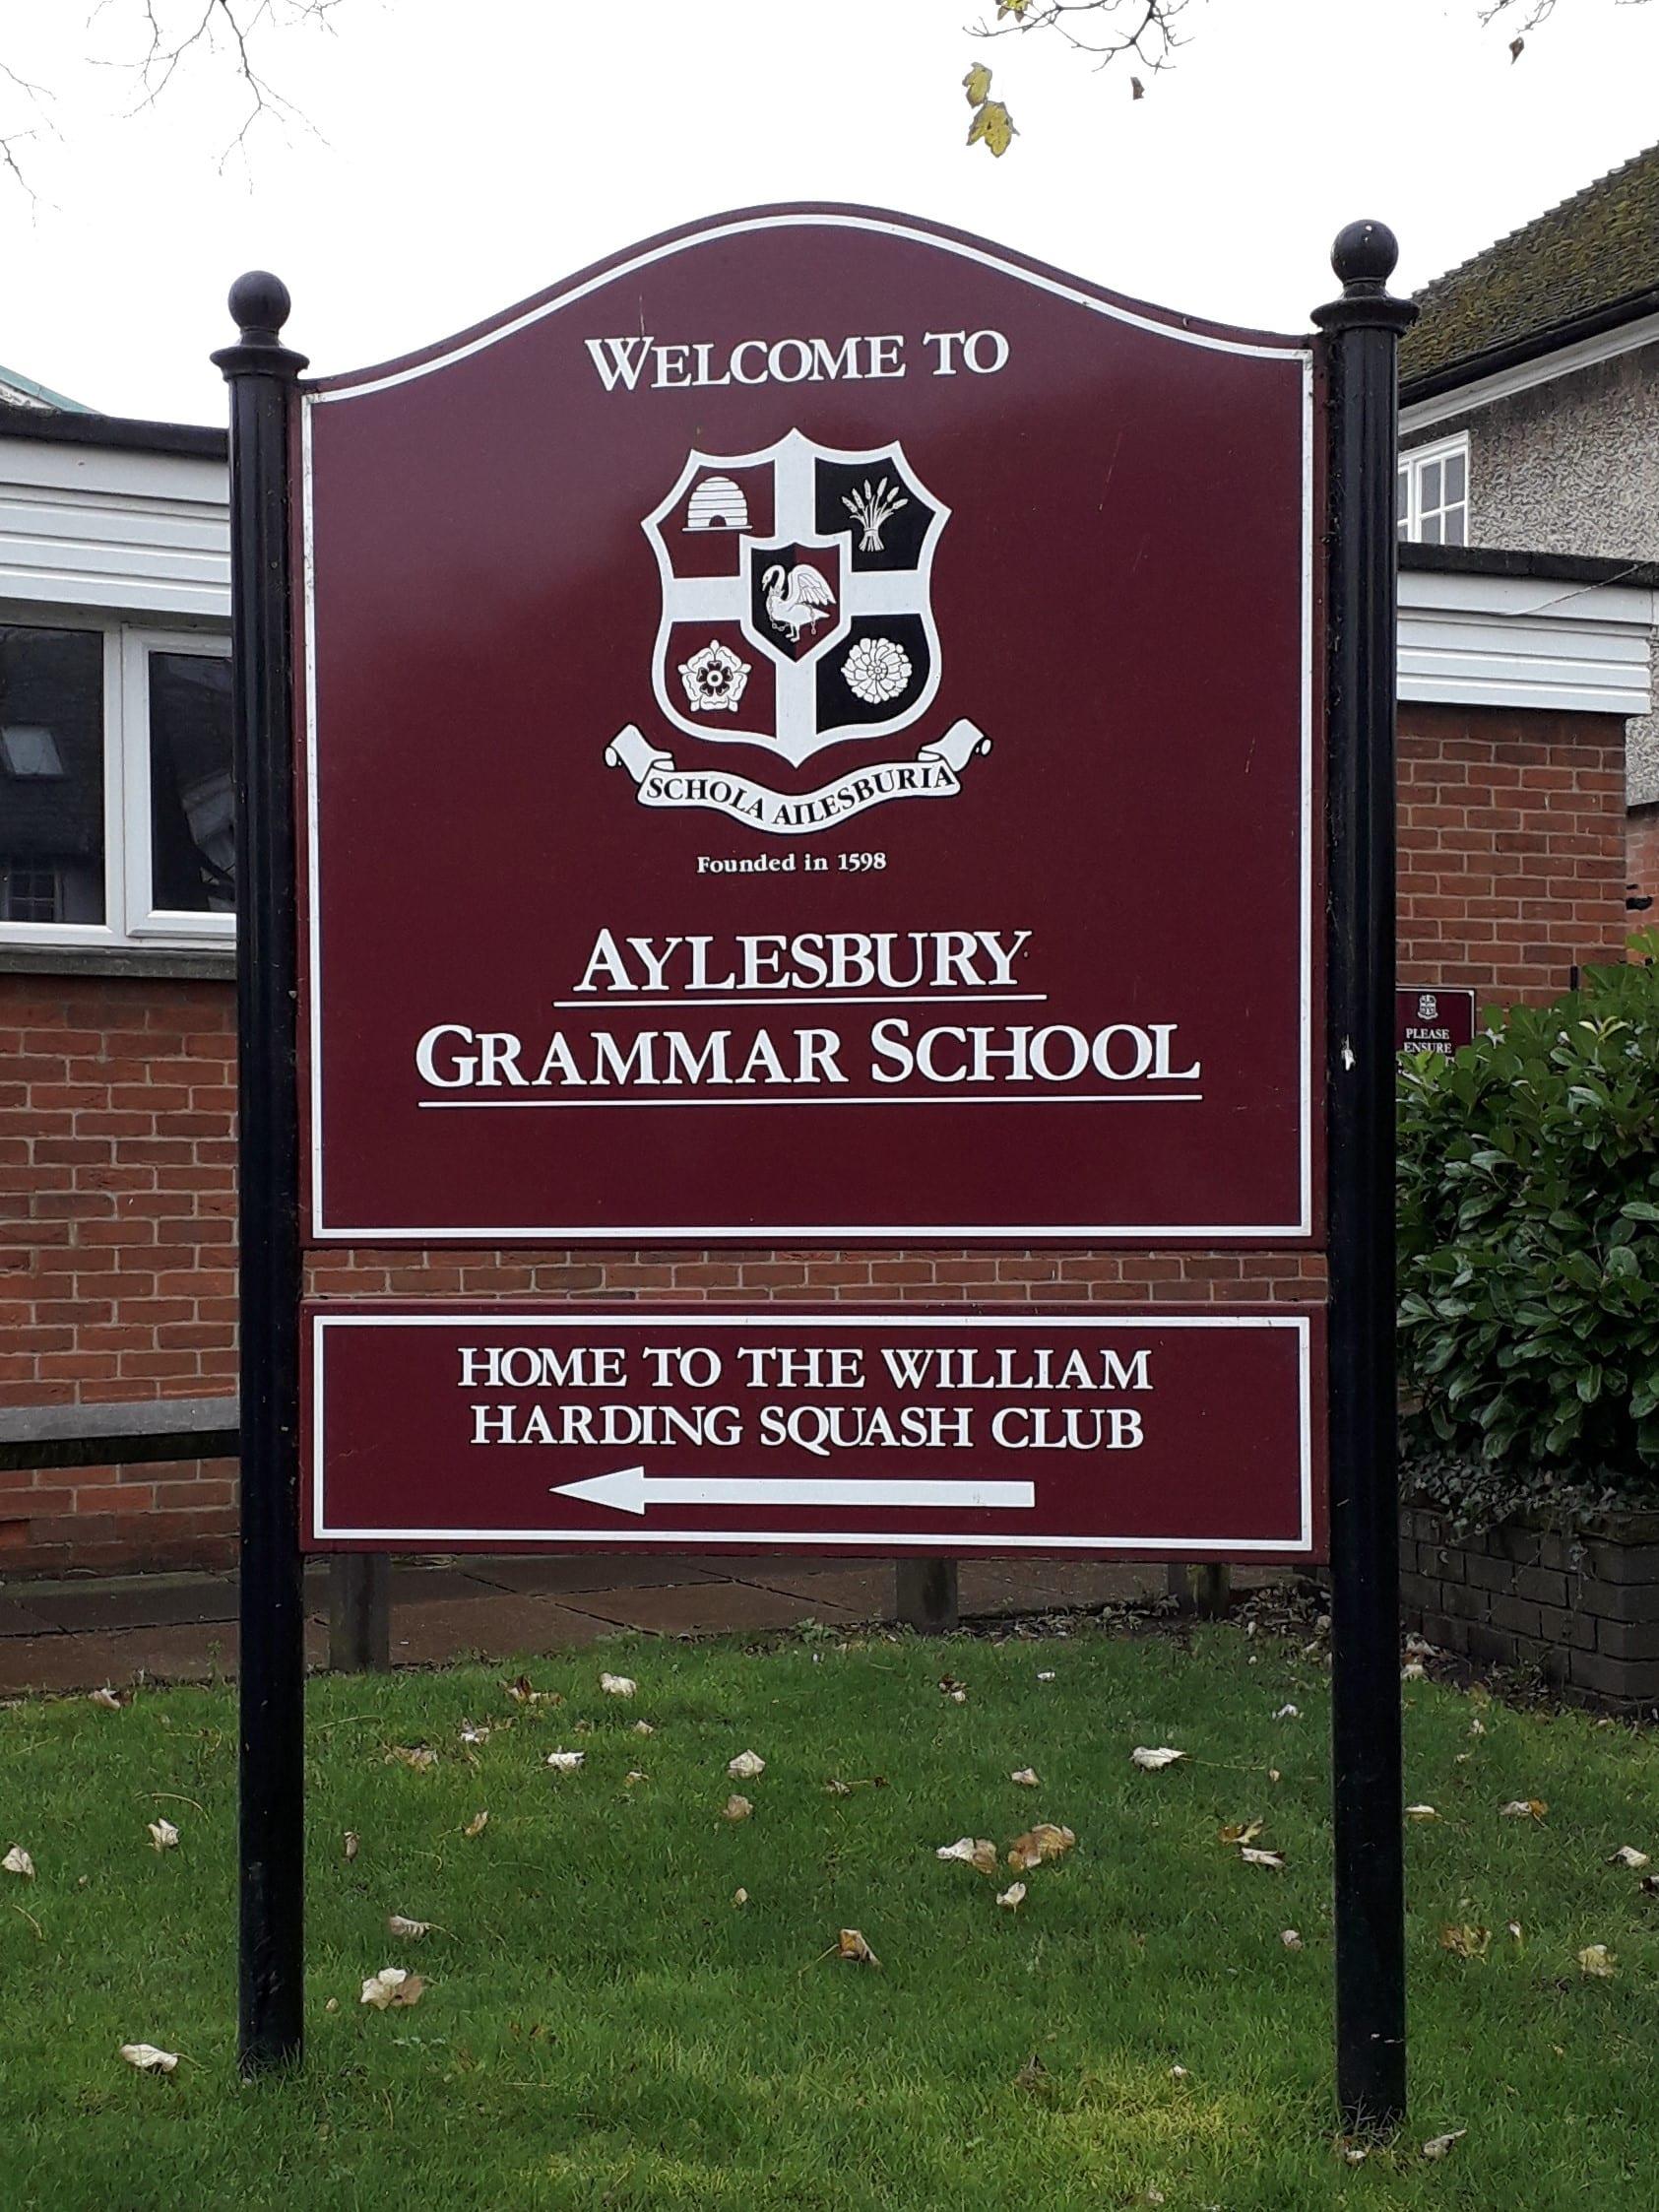 Inspection of 2 Fire Escapes, Aylesbury Grammar School, Aylesbury, Buckinghamshire 1